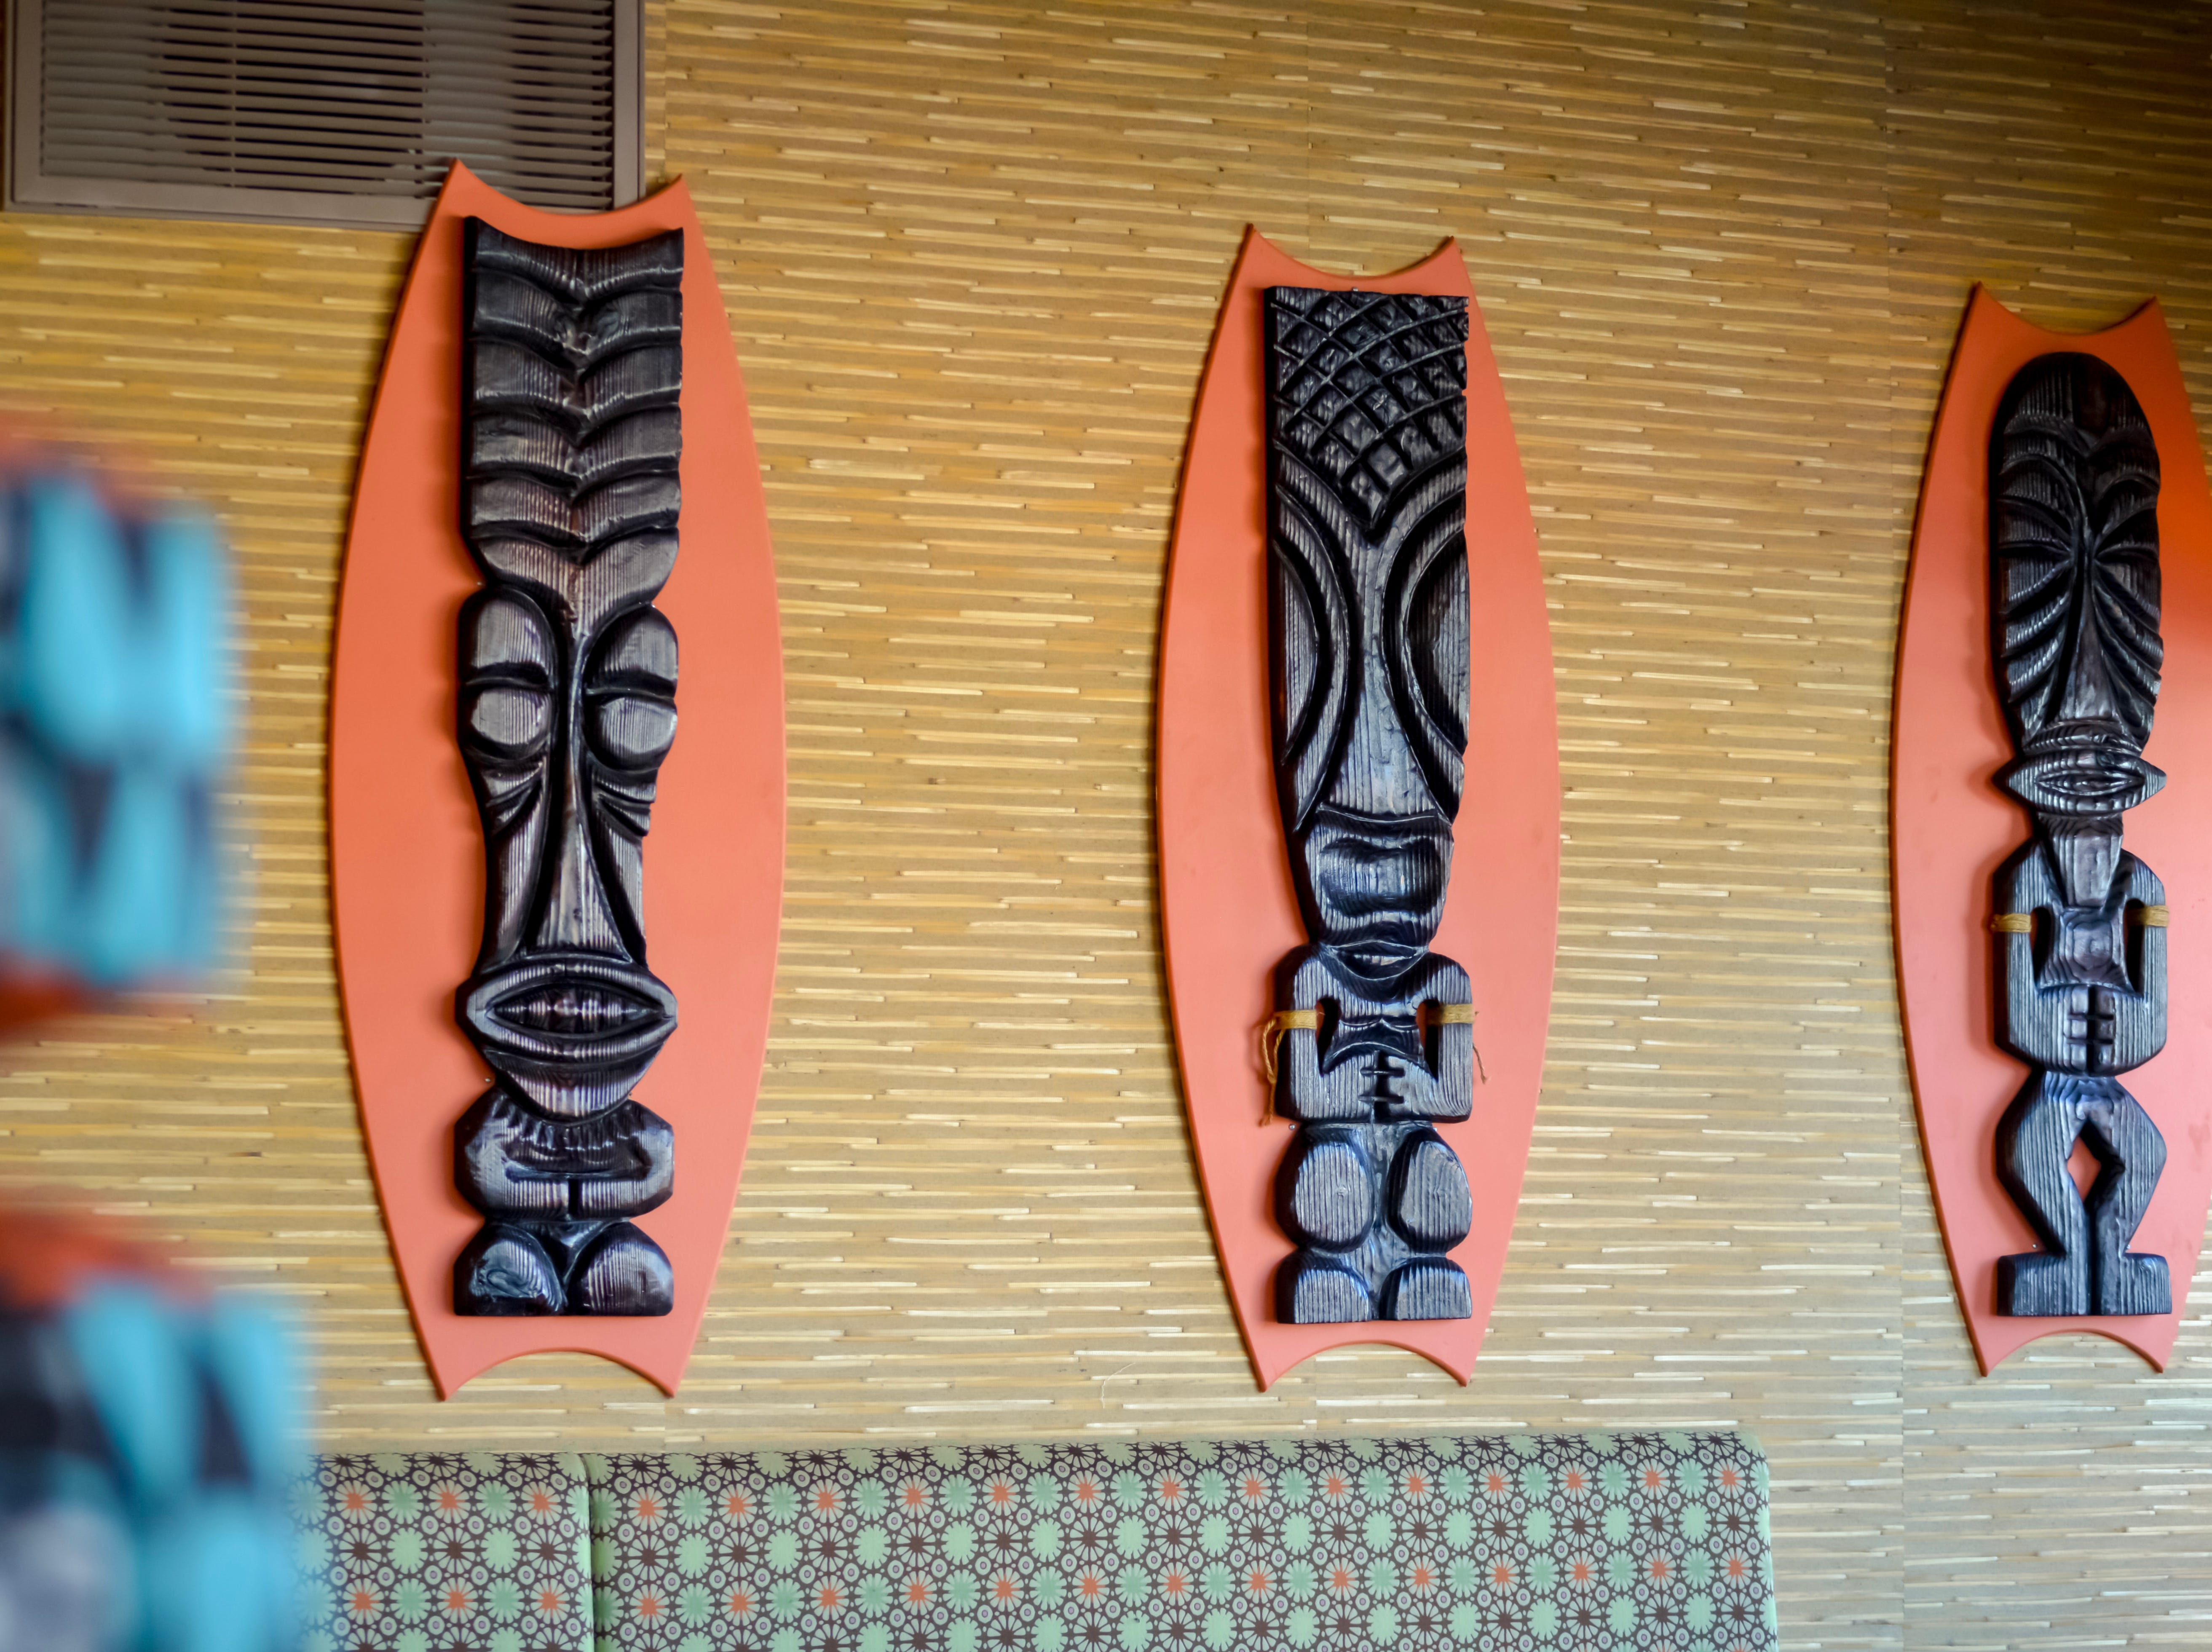 Custom tiki totems at Hula's Modern Tiki.